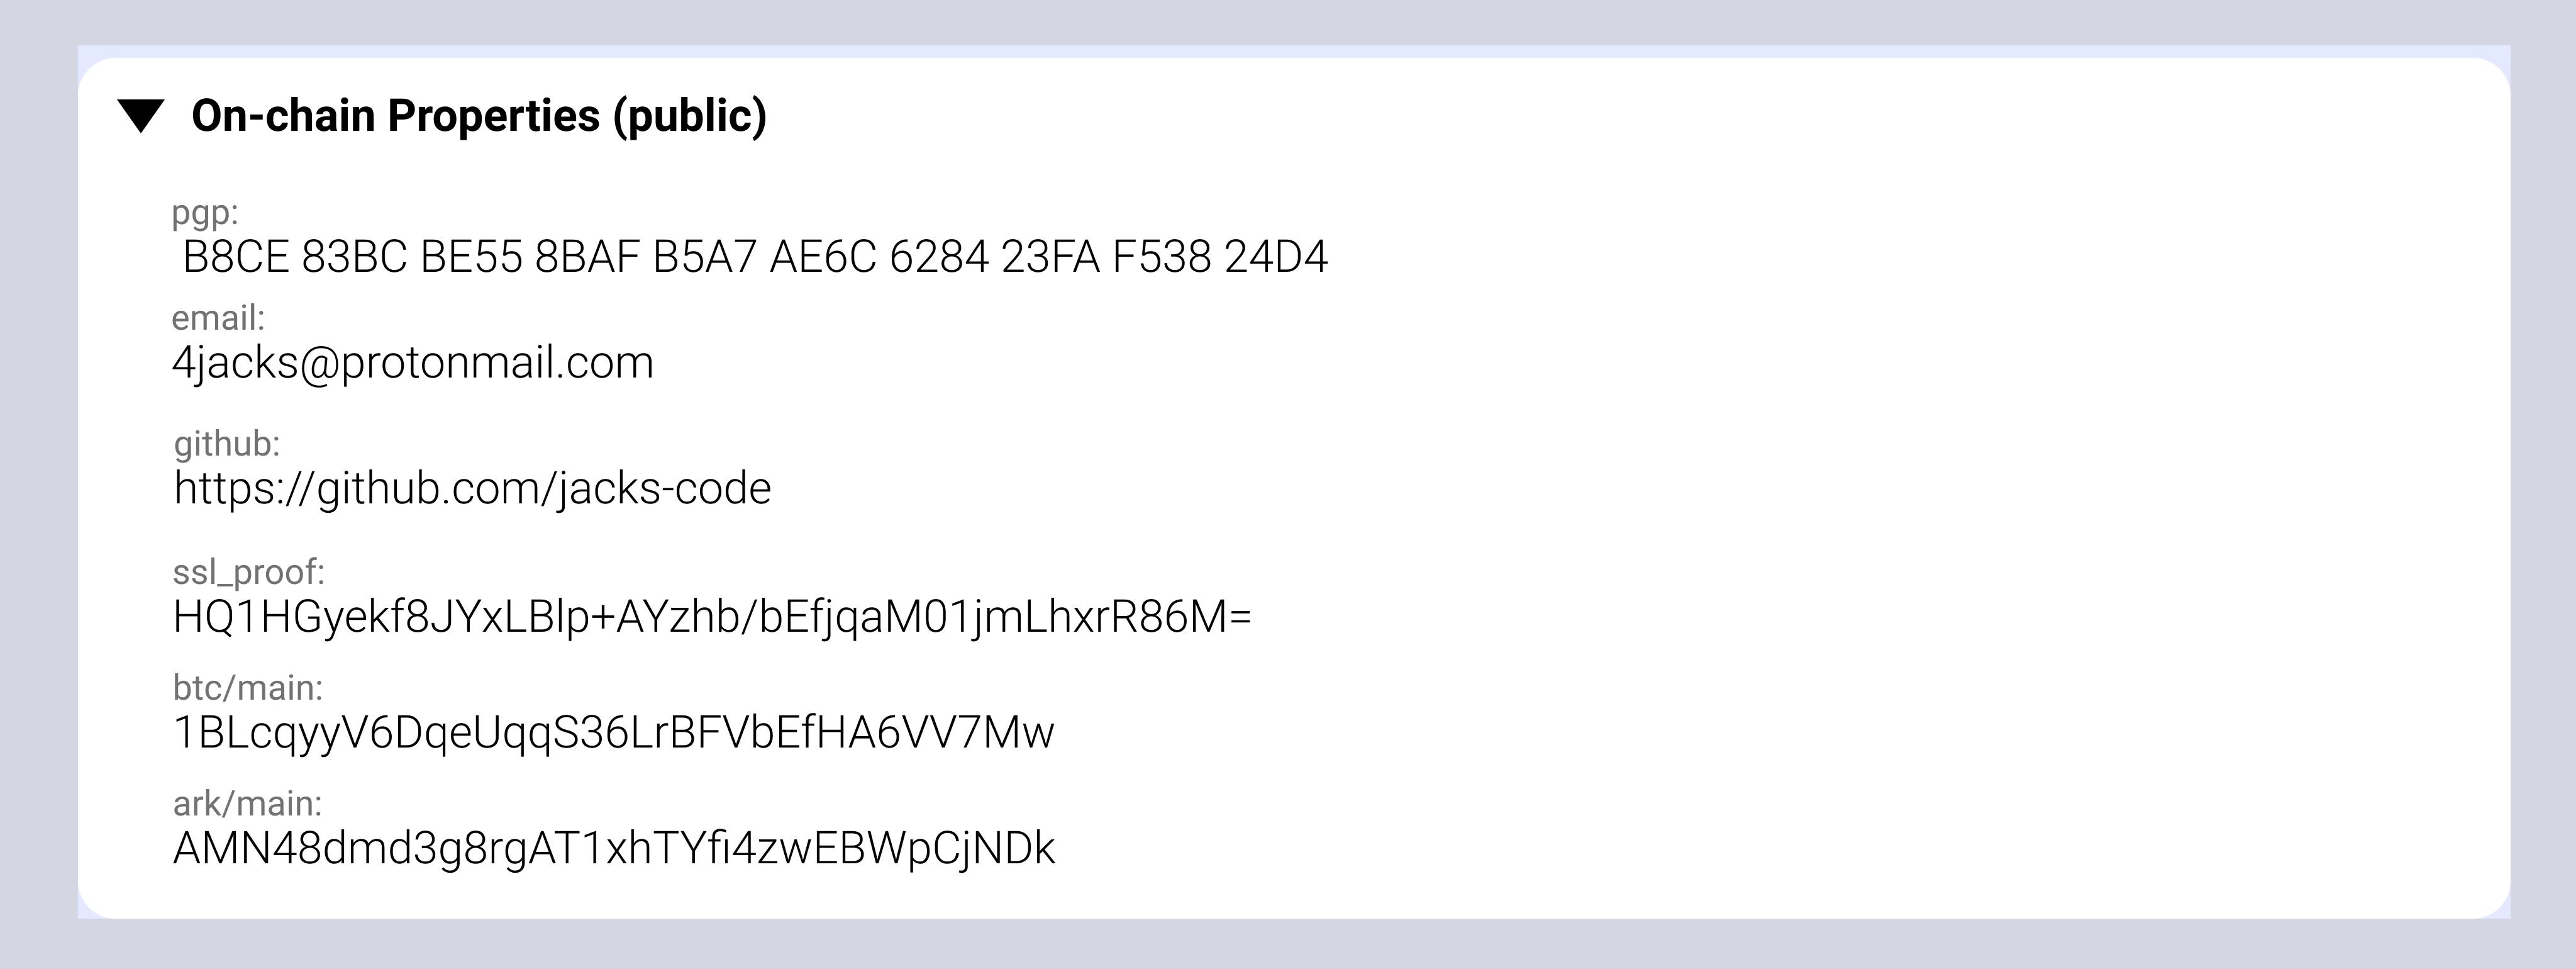 jack-sparrow-idcard-properties.png